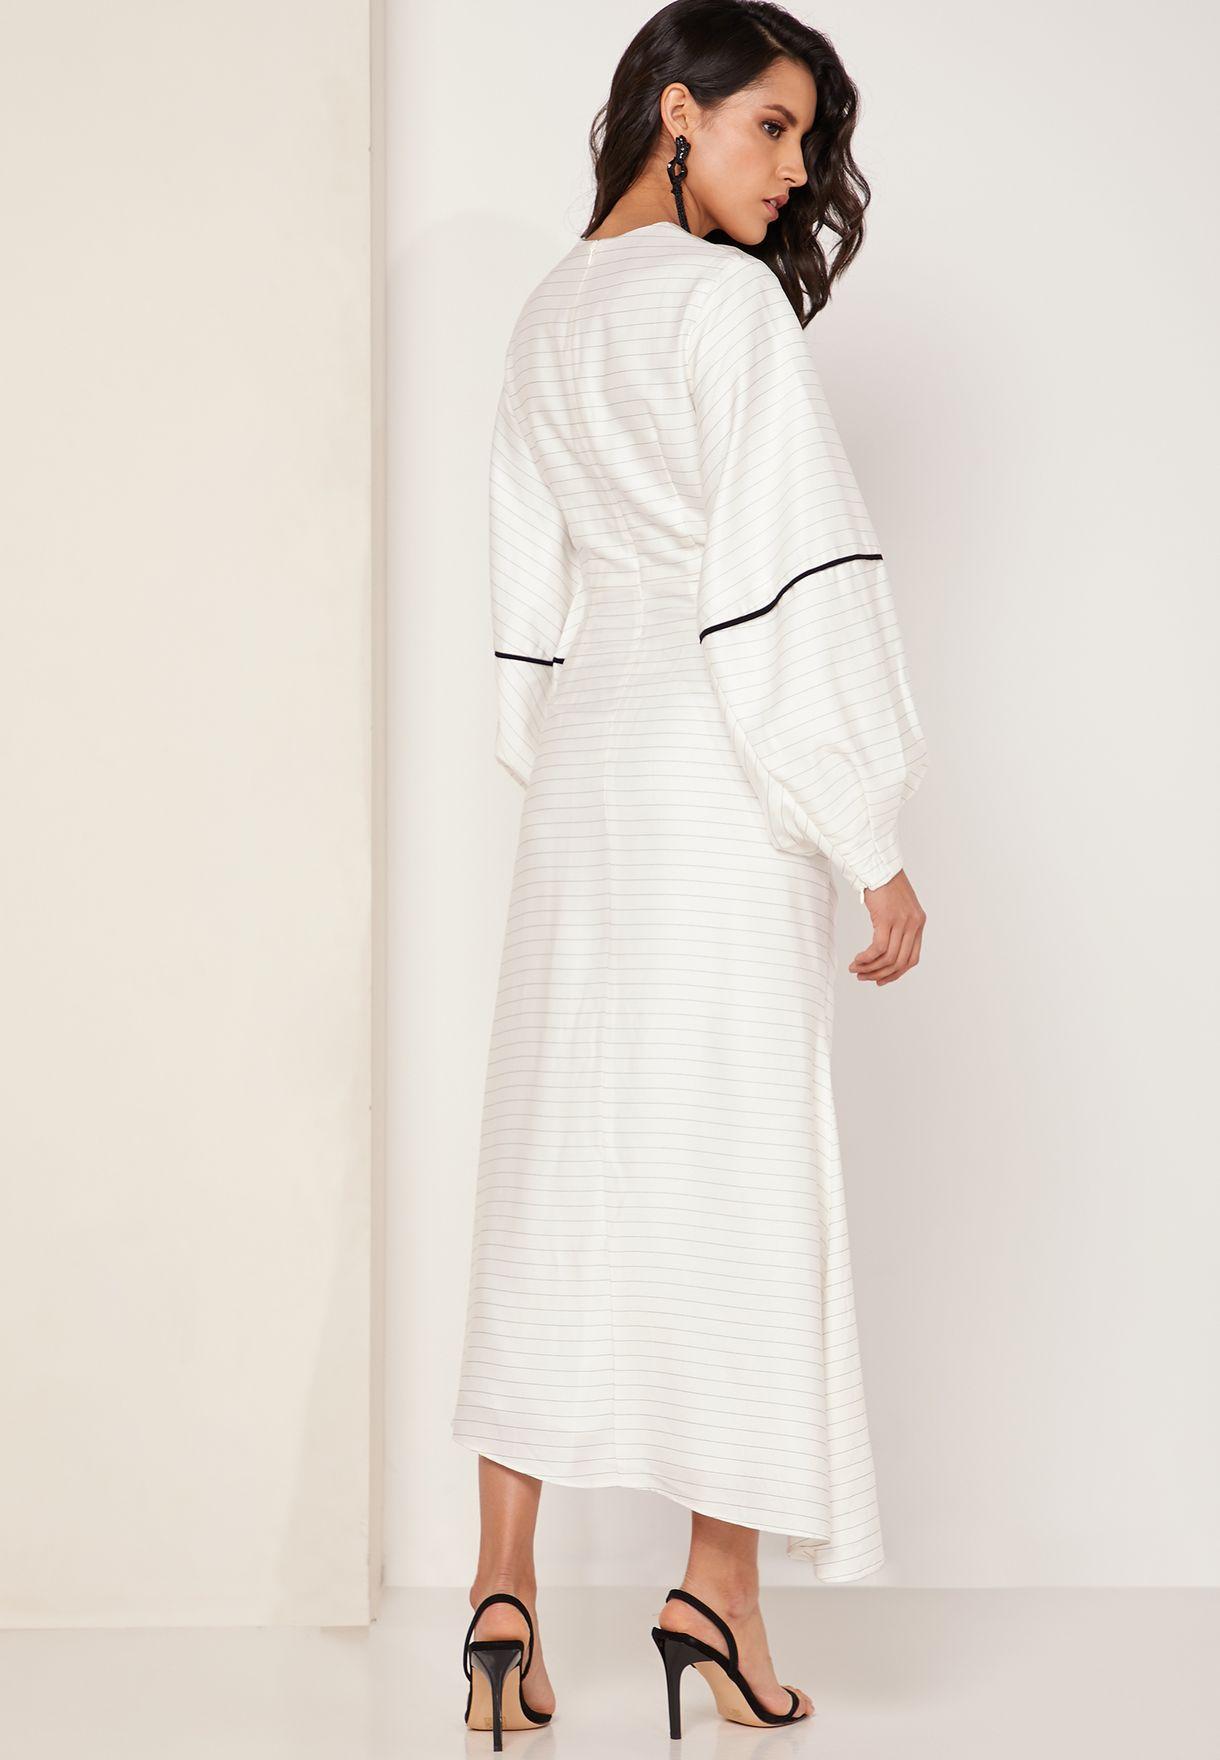 Fever Puff Sleeve Ruched Midi Dress